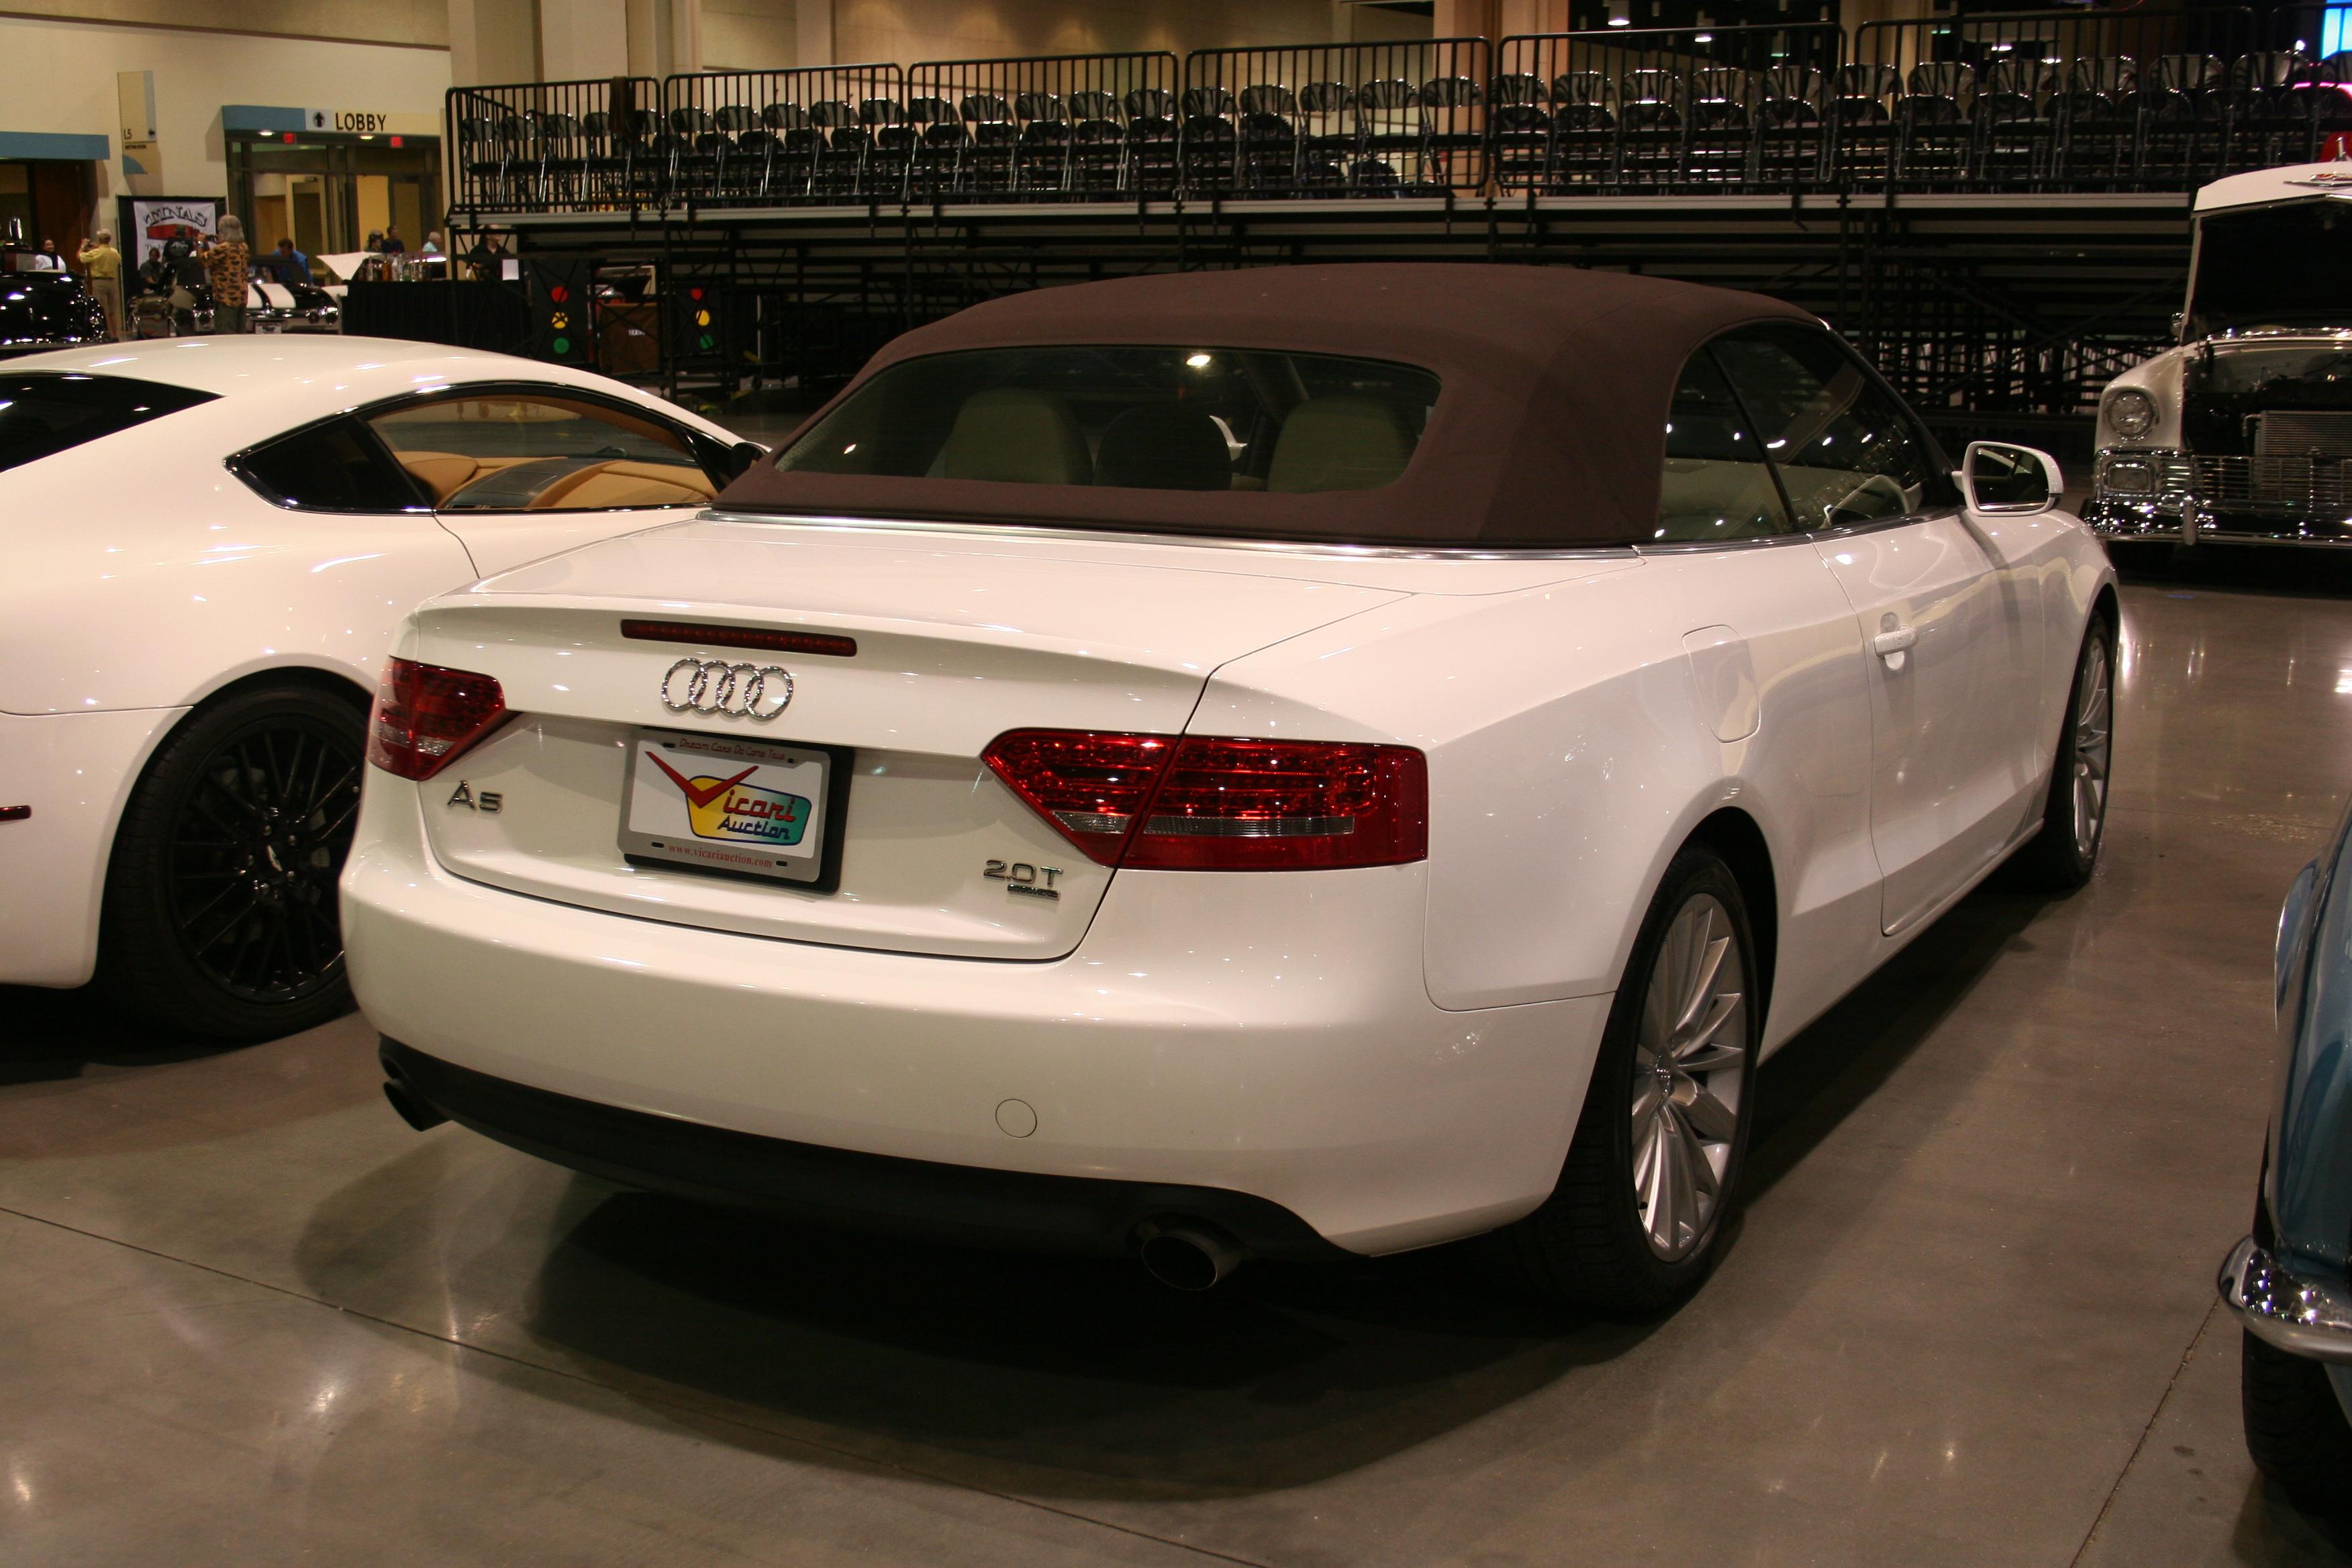 model sunnyvale used beige premium audi make black ca plus year sale condition usautomobile for great